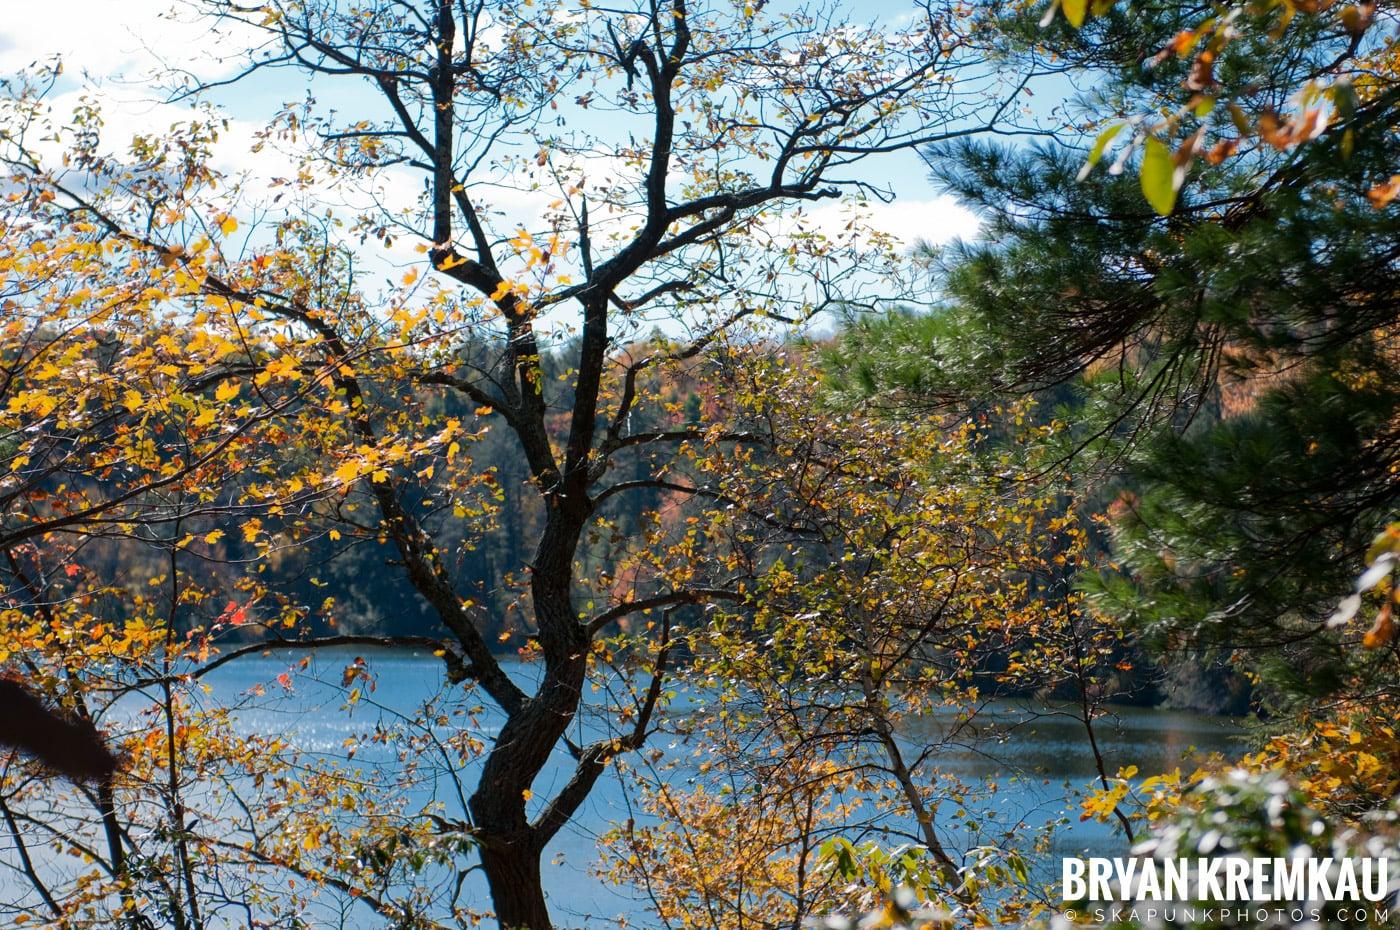 Minnewaska State Park Preserve @ Wawarsing, New York - 10.22.11 (23)